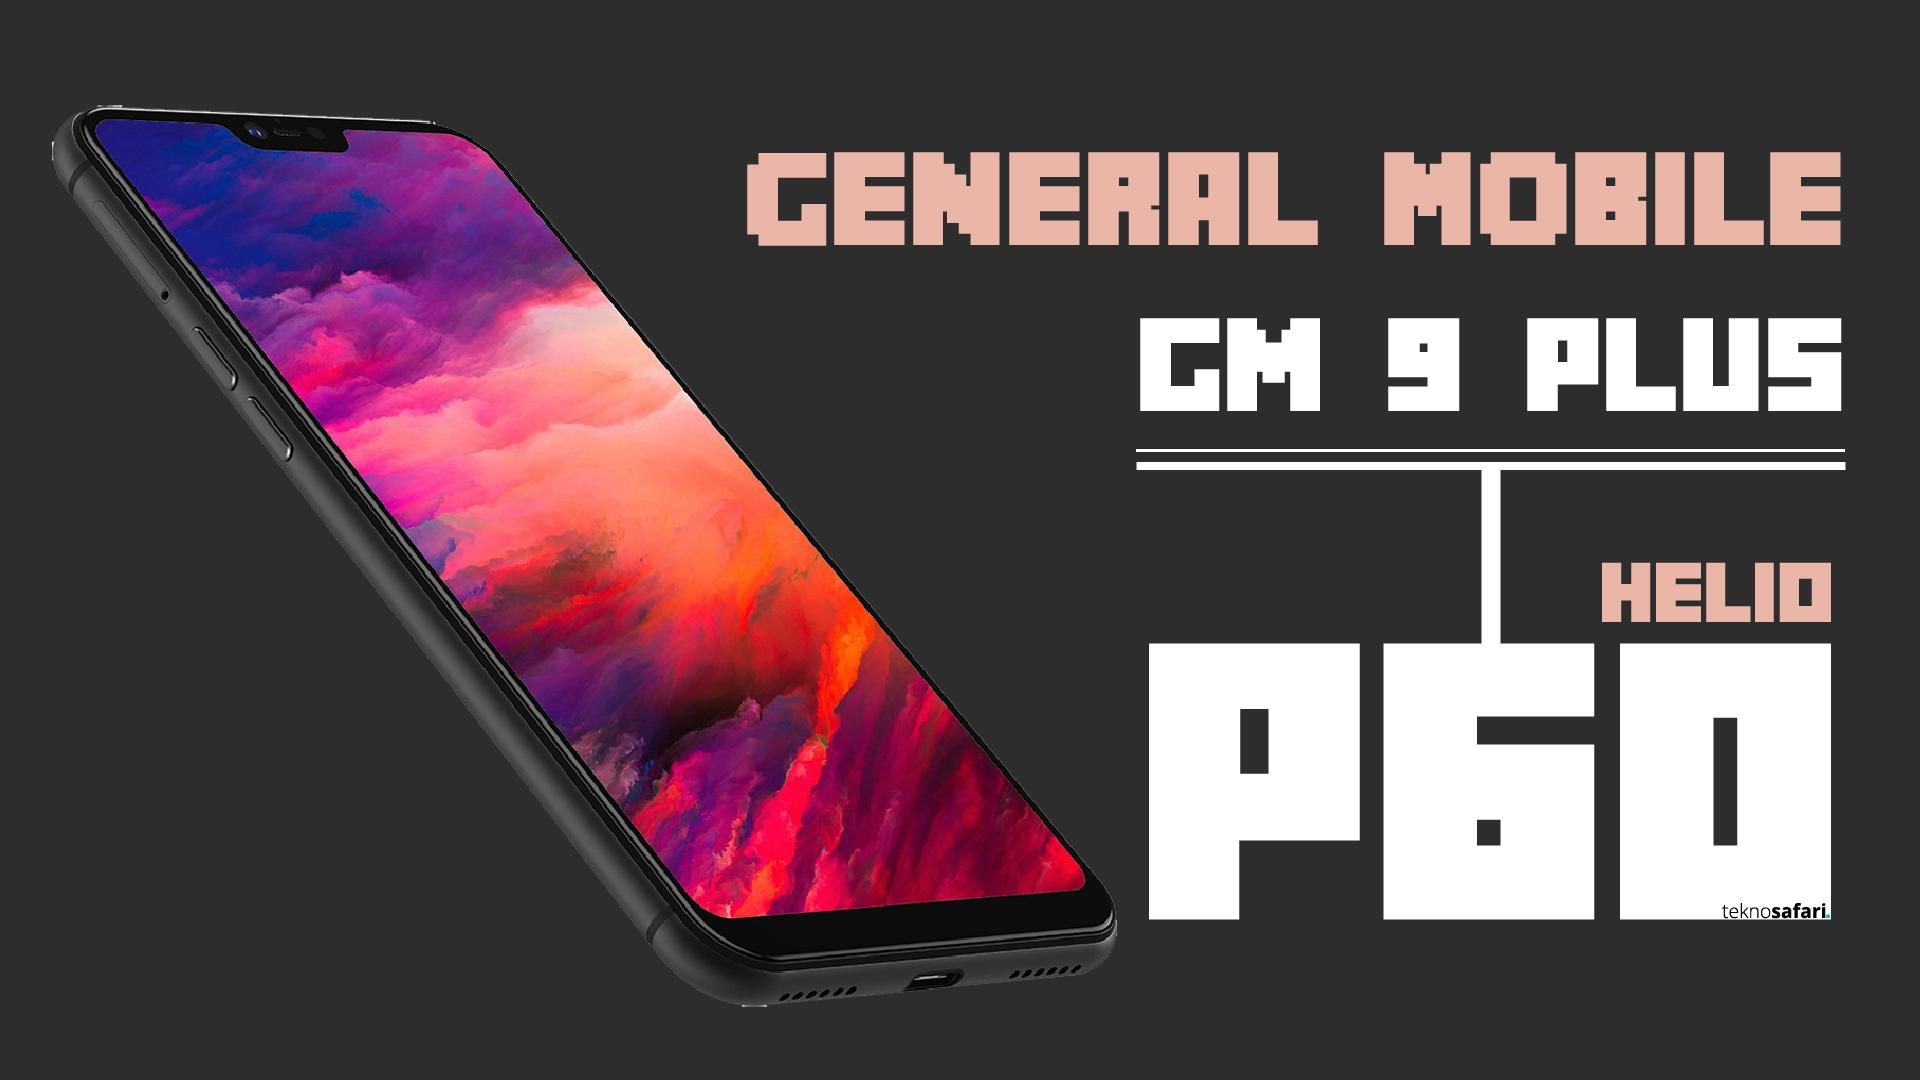 General Mobile GM 9 Plus